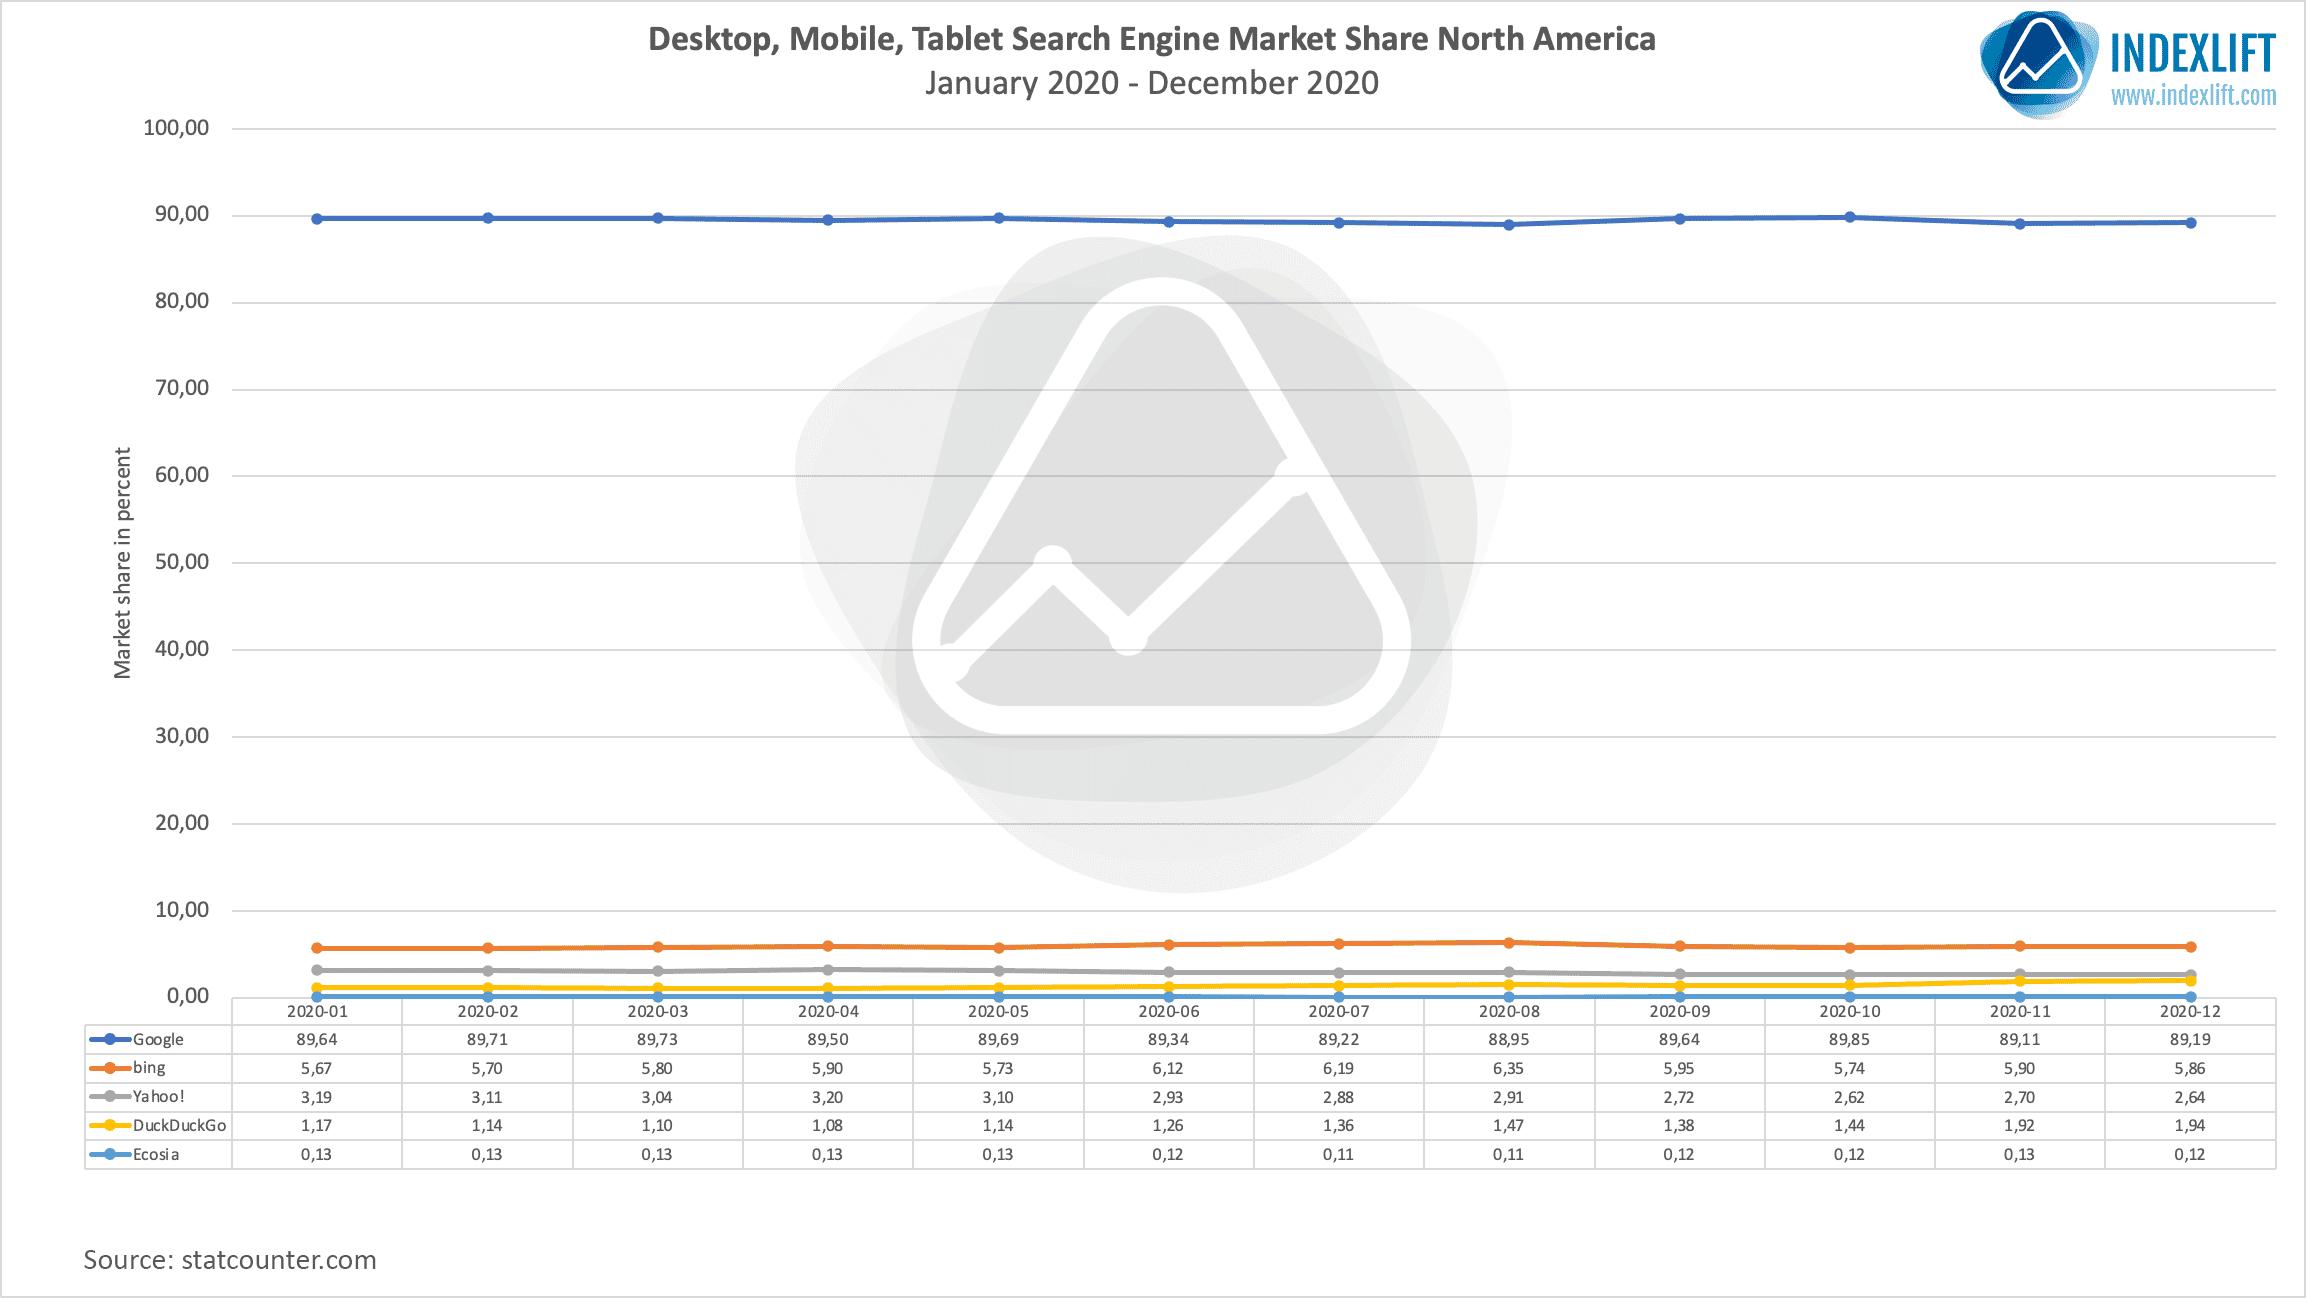 Search Engine Market Share North America 2020